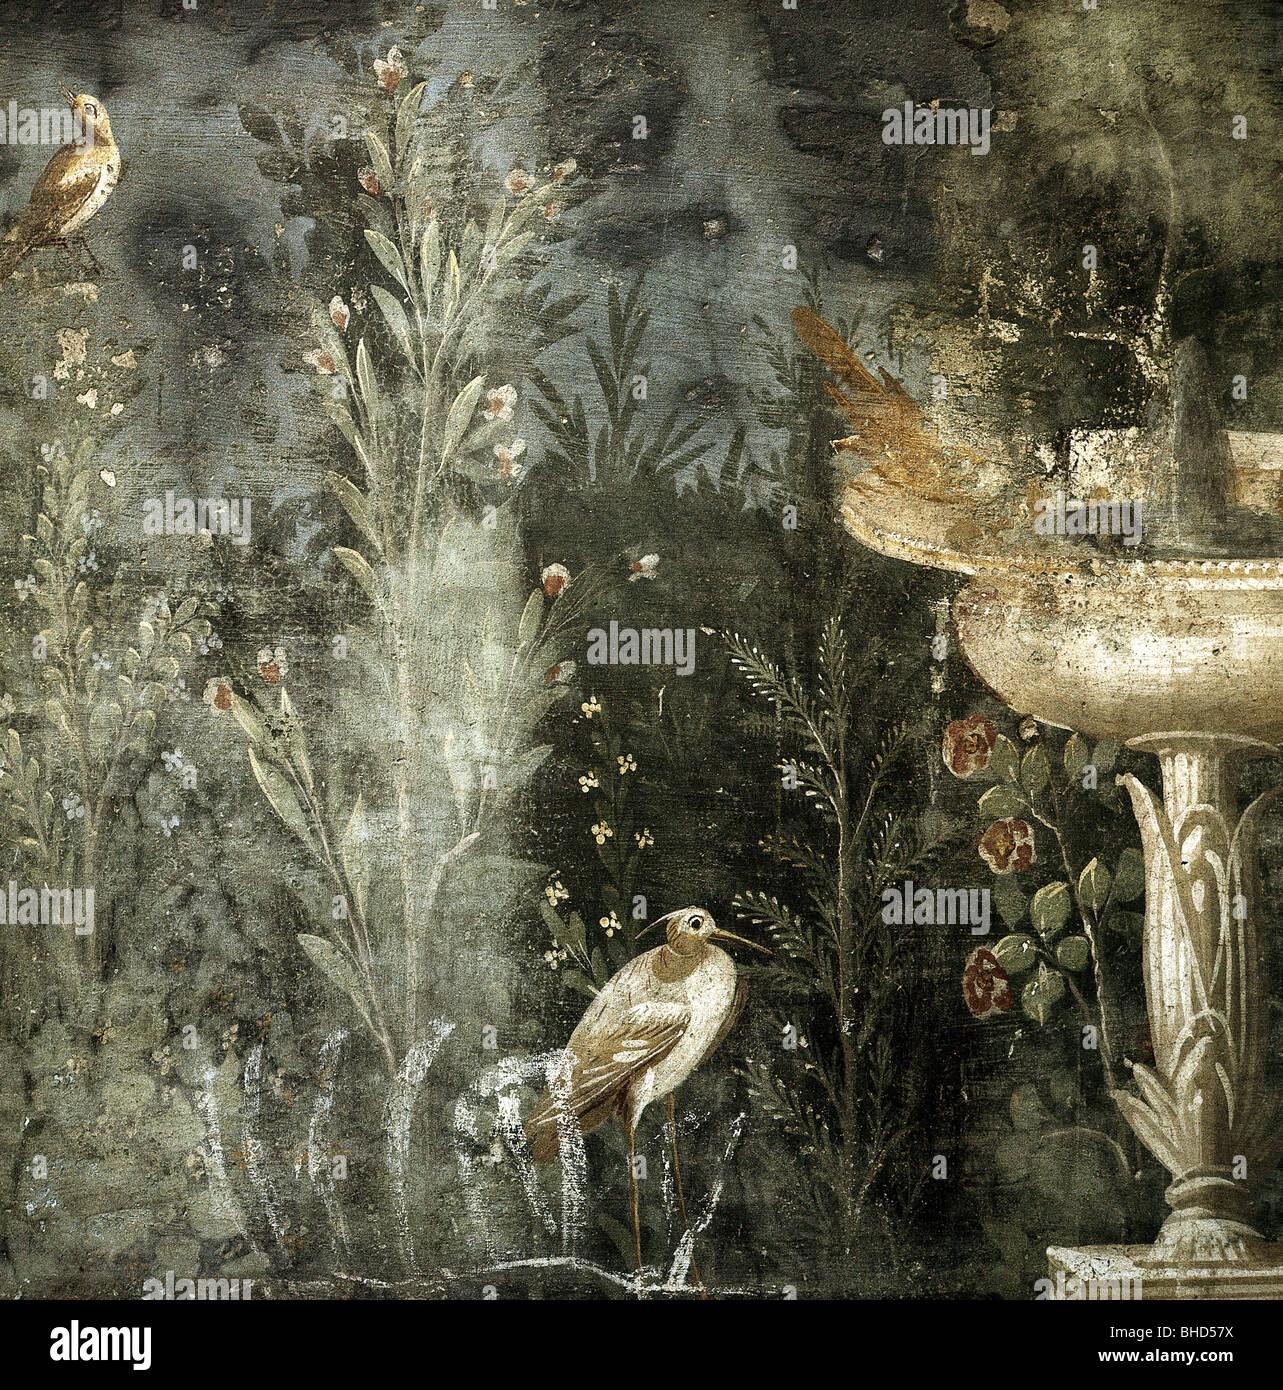 Bellas artes, Mundo Antiguo Imperio romano, Pompeya, detalle de un fresco, jardín escena, Casa de Venus, Italia, Foto de stock